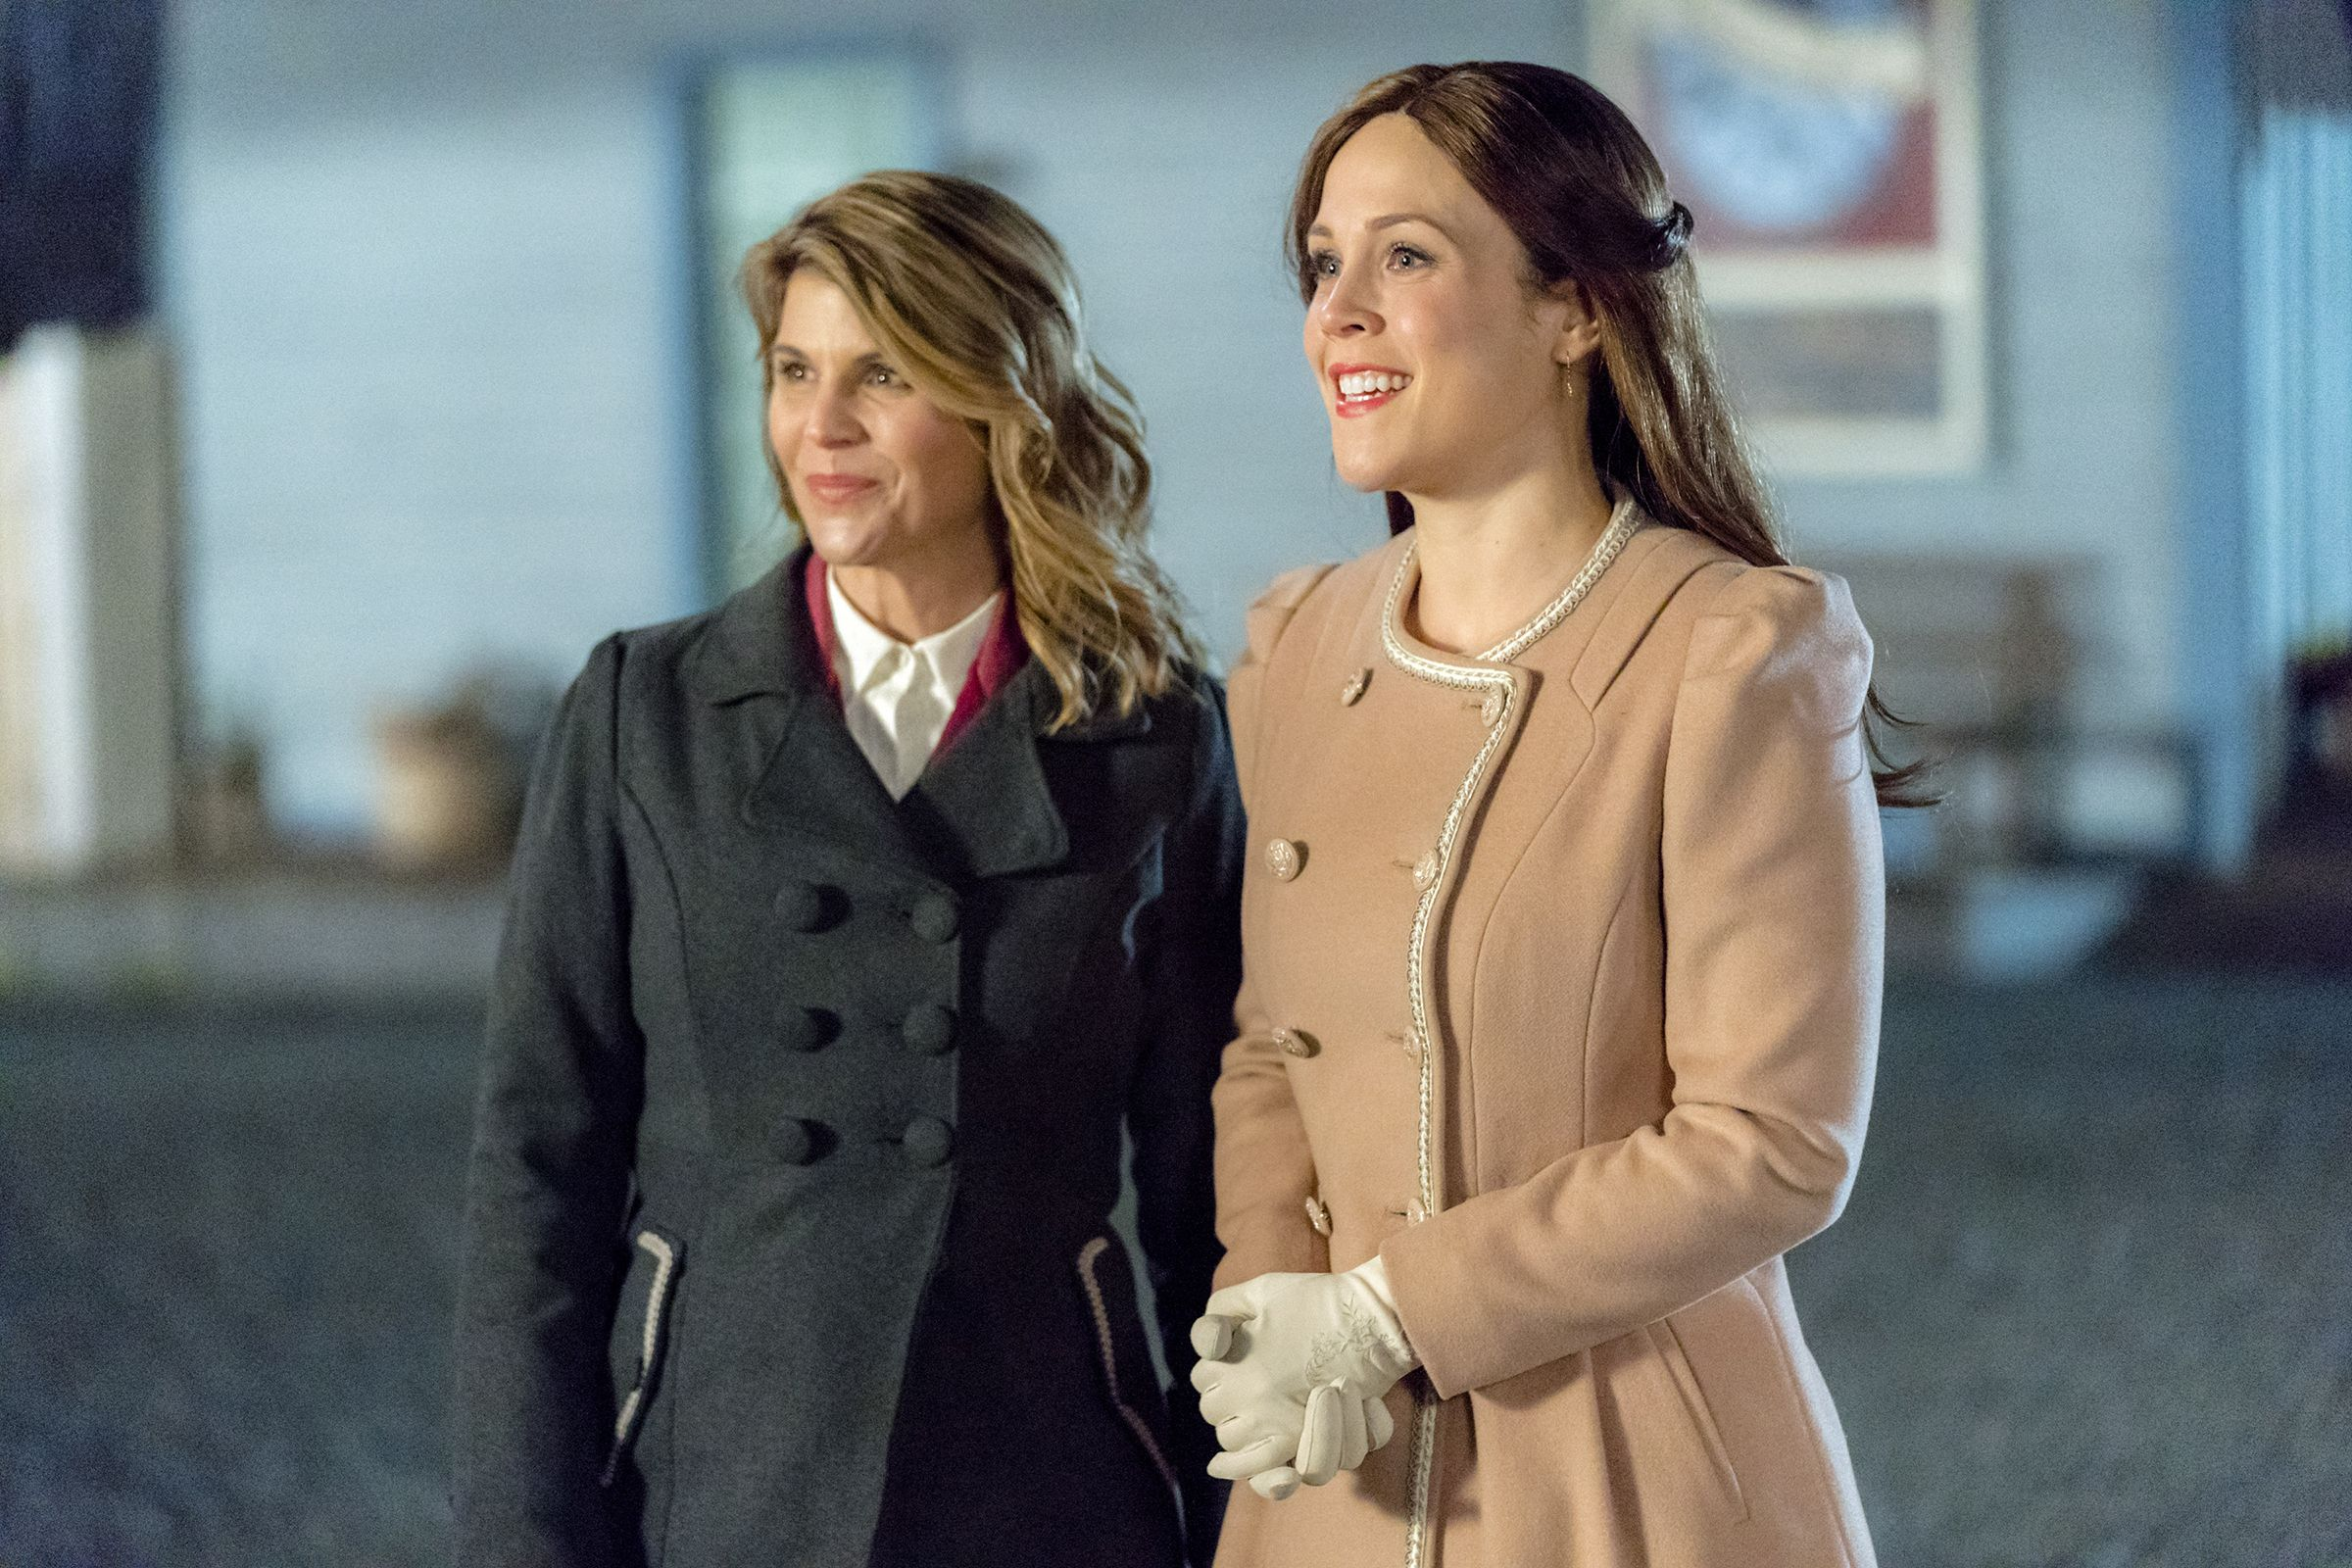 Hallmark Announces 'When Calls the Heart' Is on 'Hiatus' in Wake of Lori Loughlin Scandal